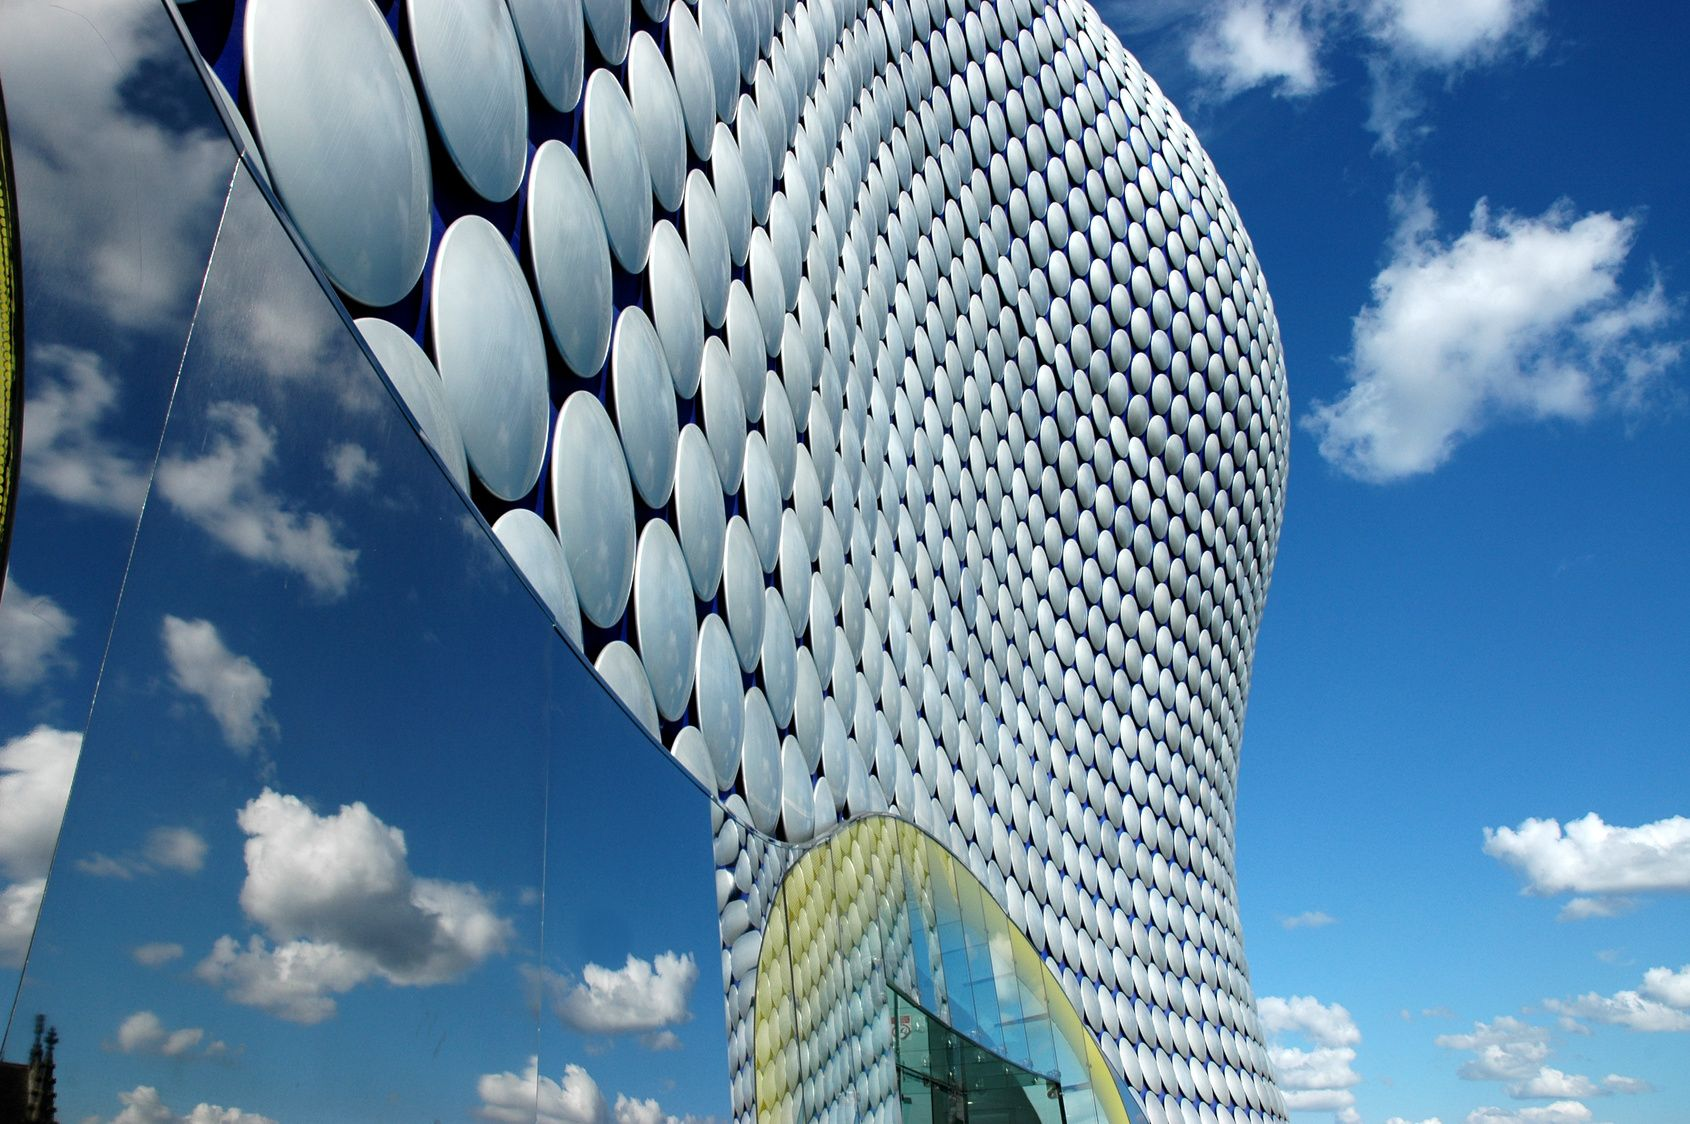 #birmingham #england #skyporn #modernarchitecture